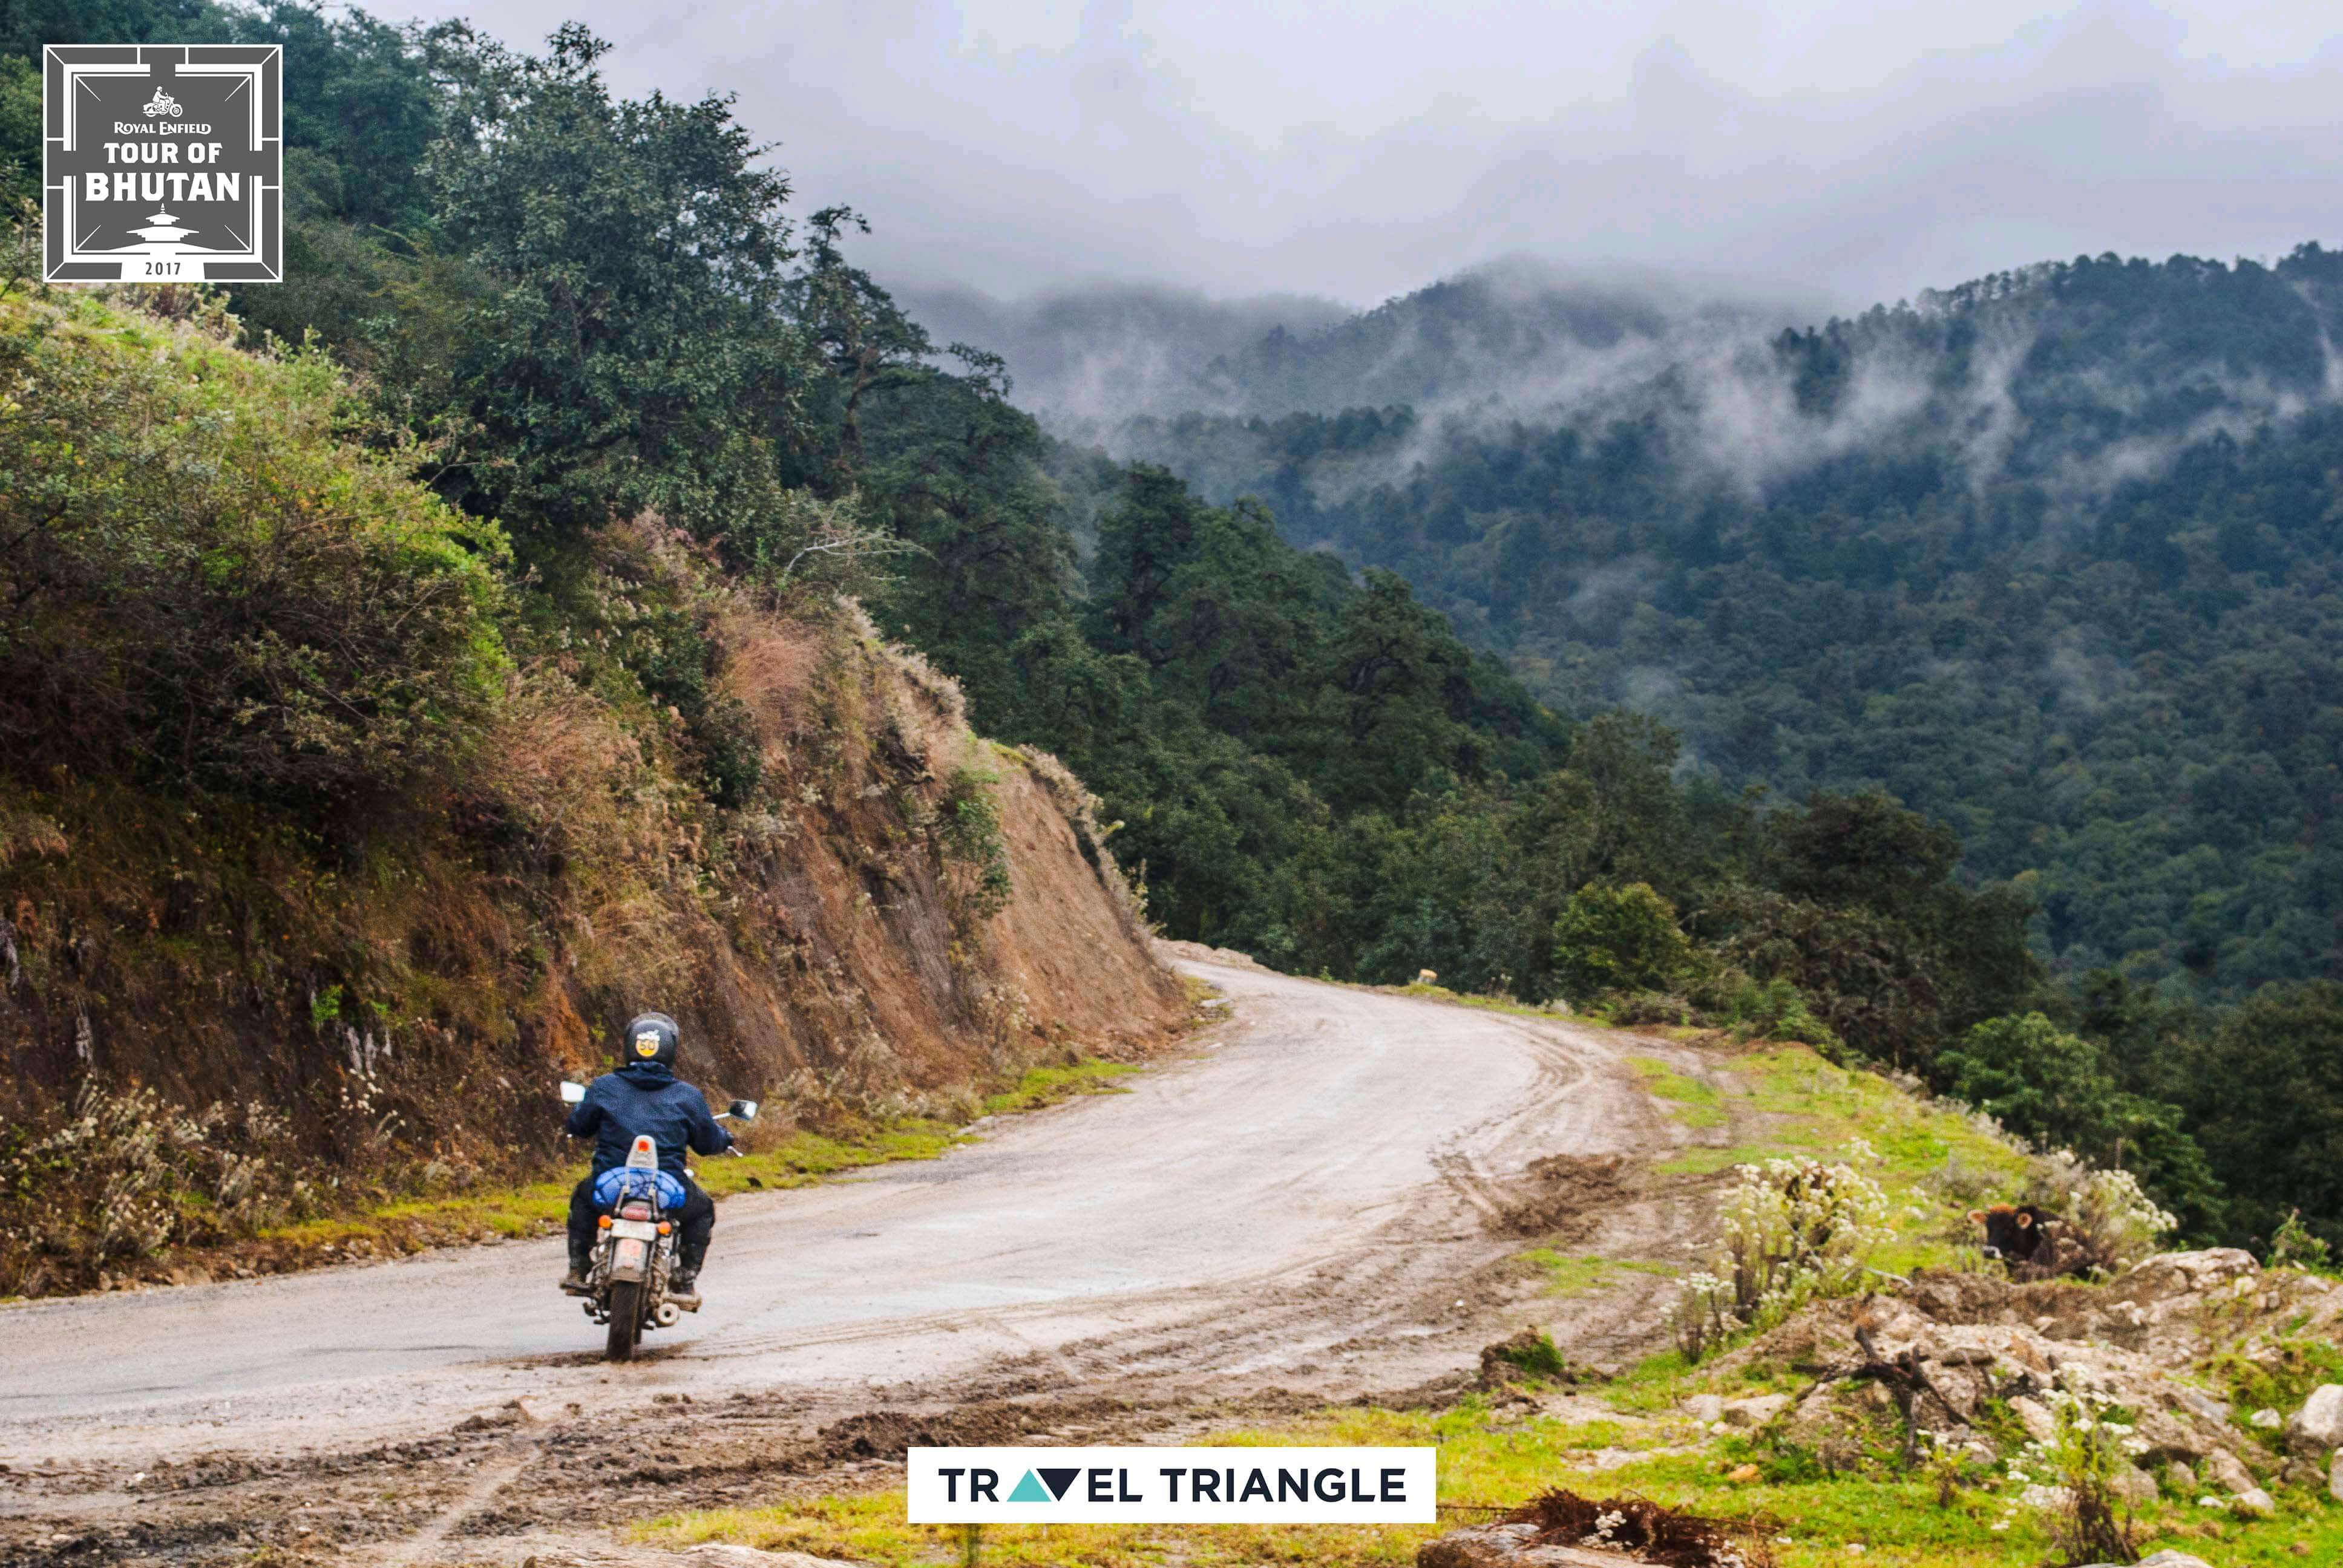 royal enfield india bhutan road trip: the trip ends